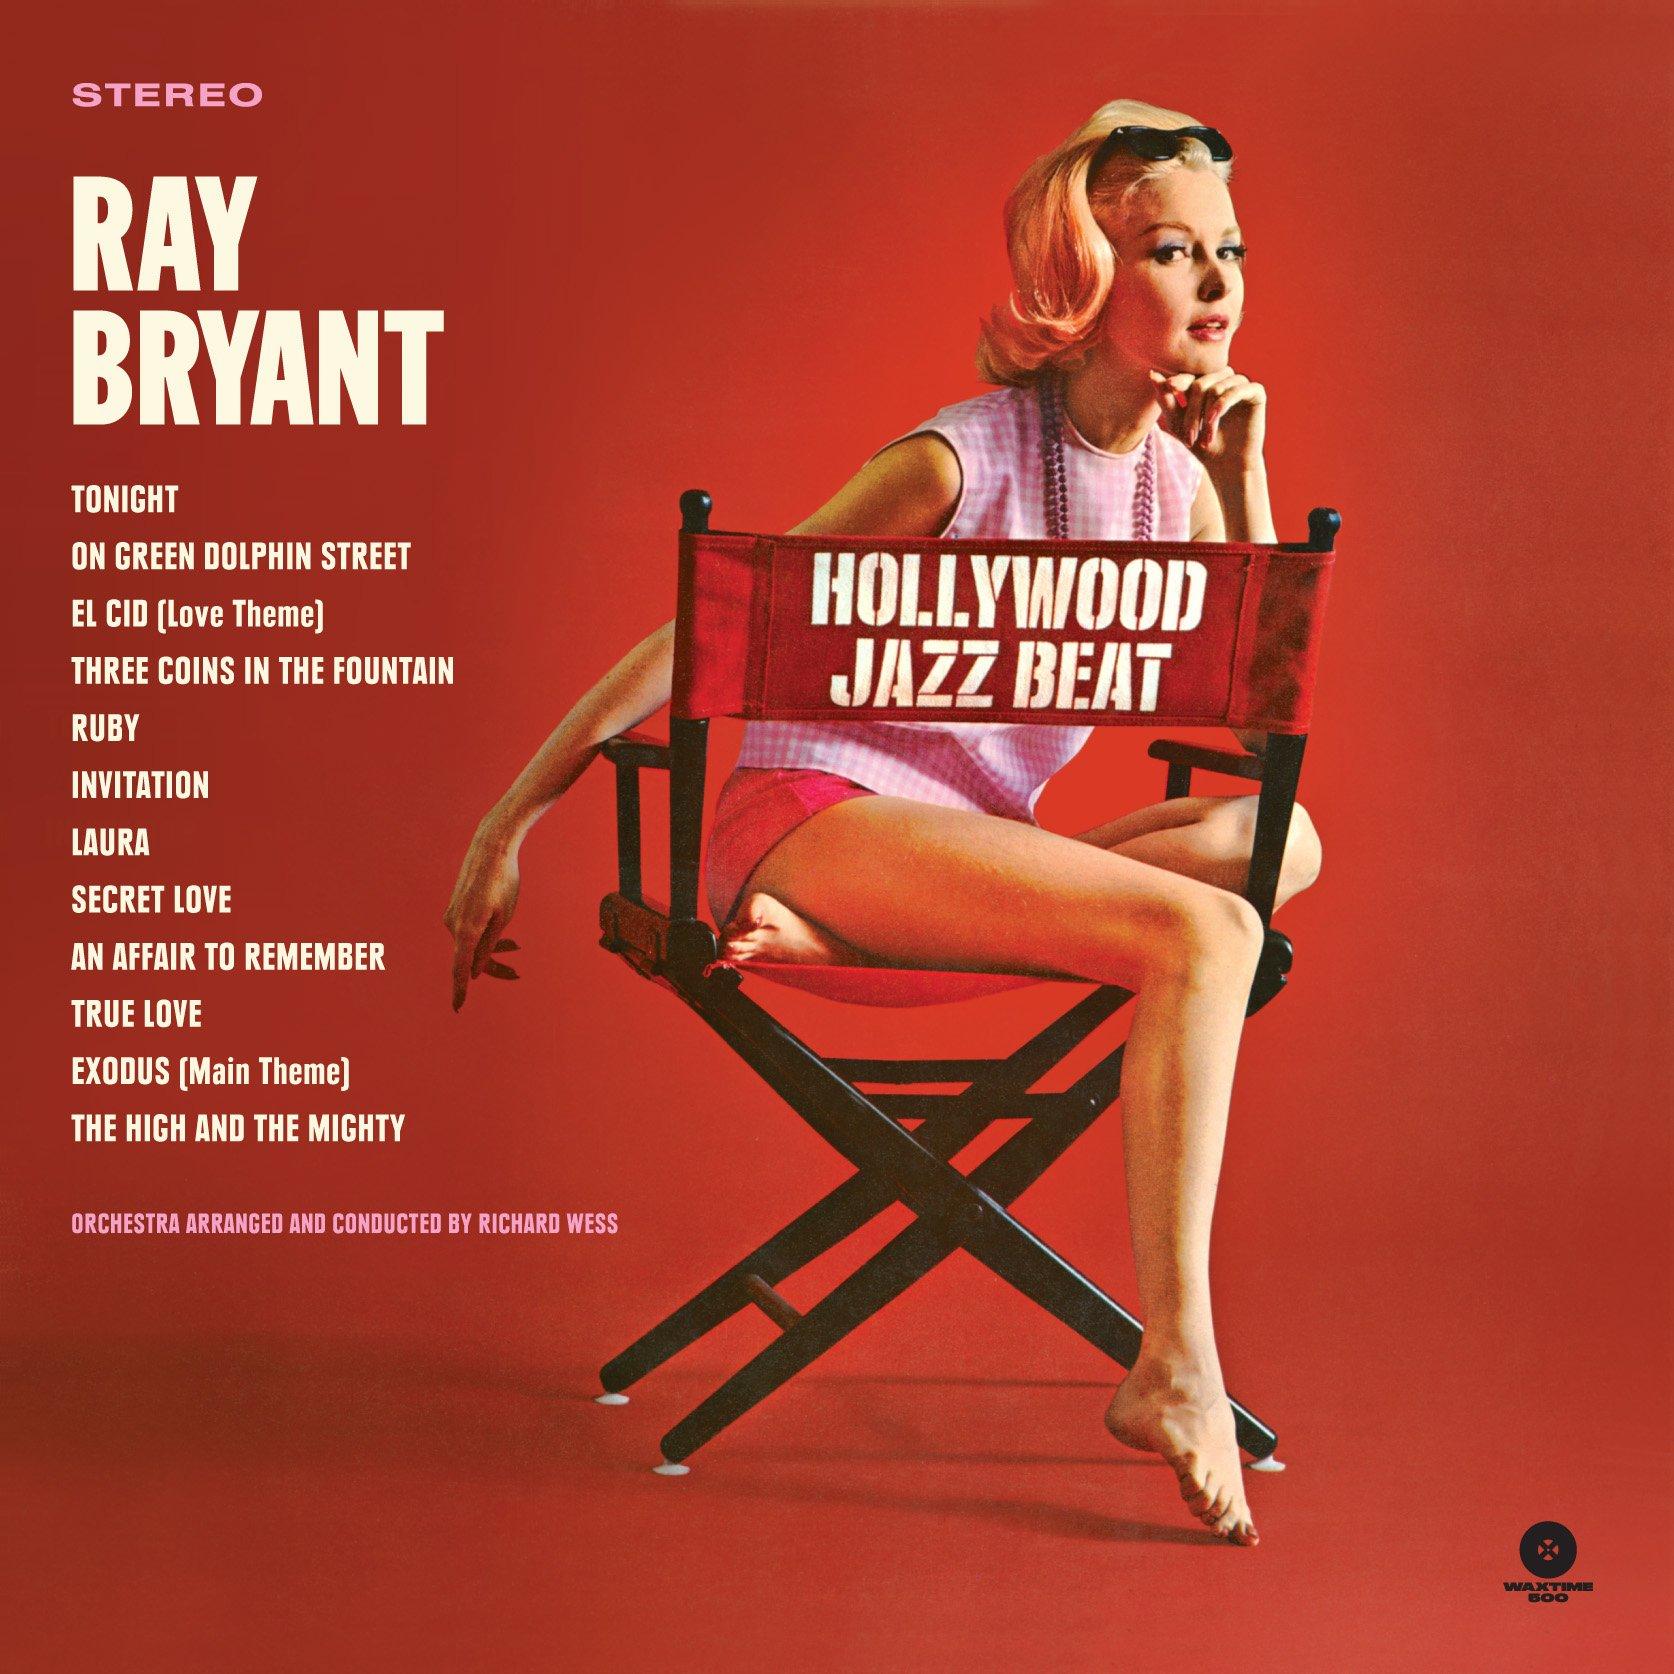 Vinilo : Ray Bryant - Hollywood Jazz Beat (Limited Edition, 180 Gram Vinyl, Collector's Edition, Virgin Vinyl, Remastered)